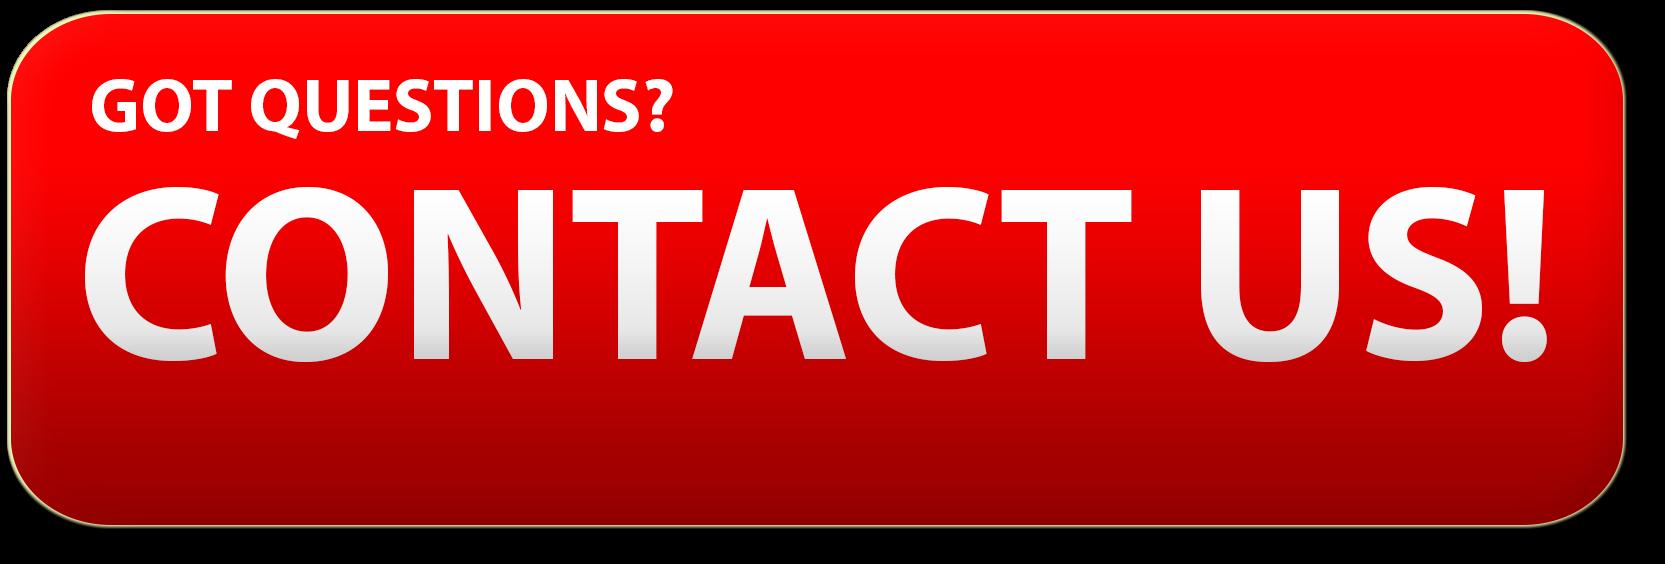 Contact-Liquor-License-Application-Consultants